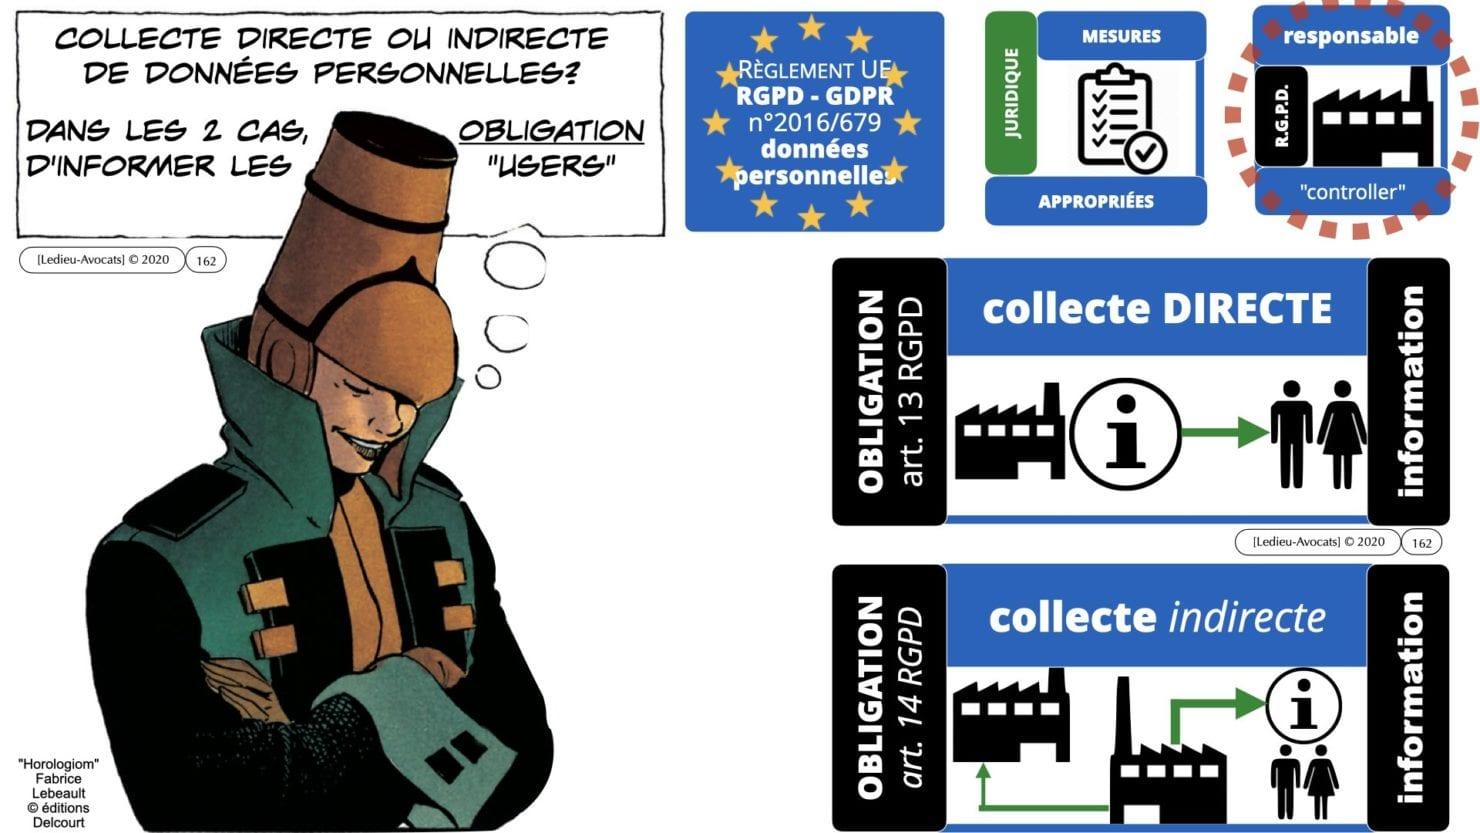 RGPD e-Privacy principes actualité jurisprudence ©Ledieu-Avocats 25-06-2021.162